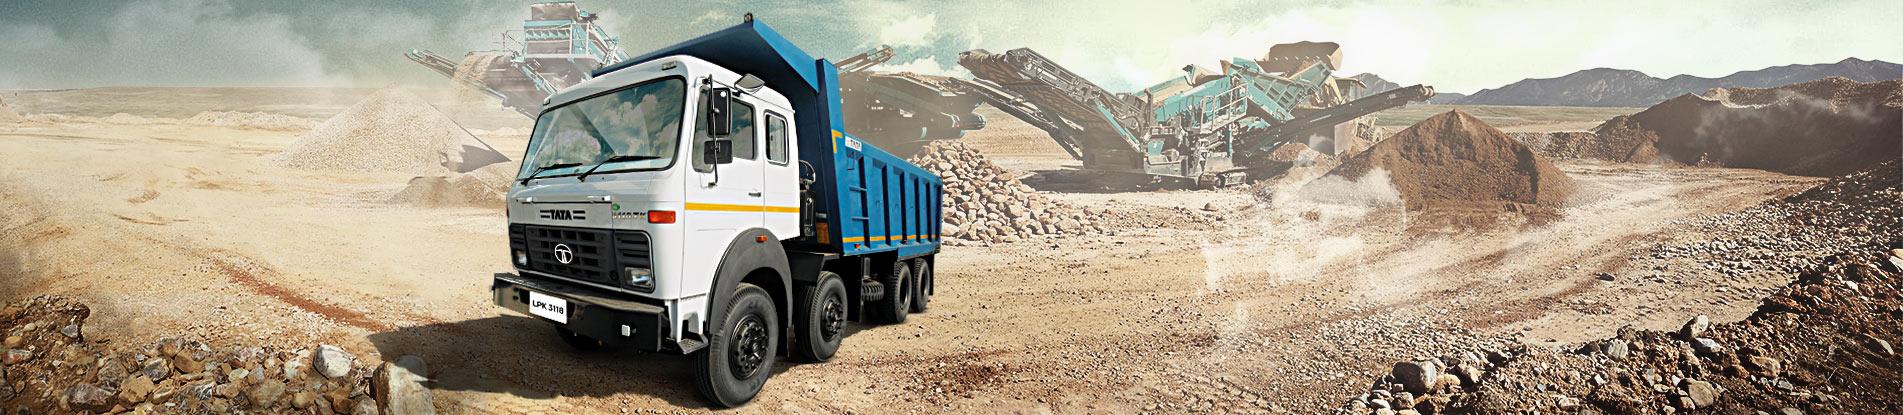 Tata Motors Bangladesh - Heavy Duty Trucks Manufacturer